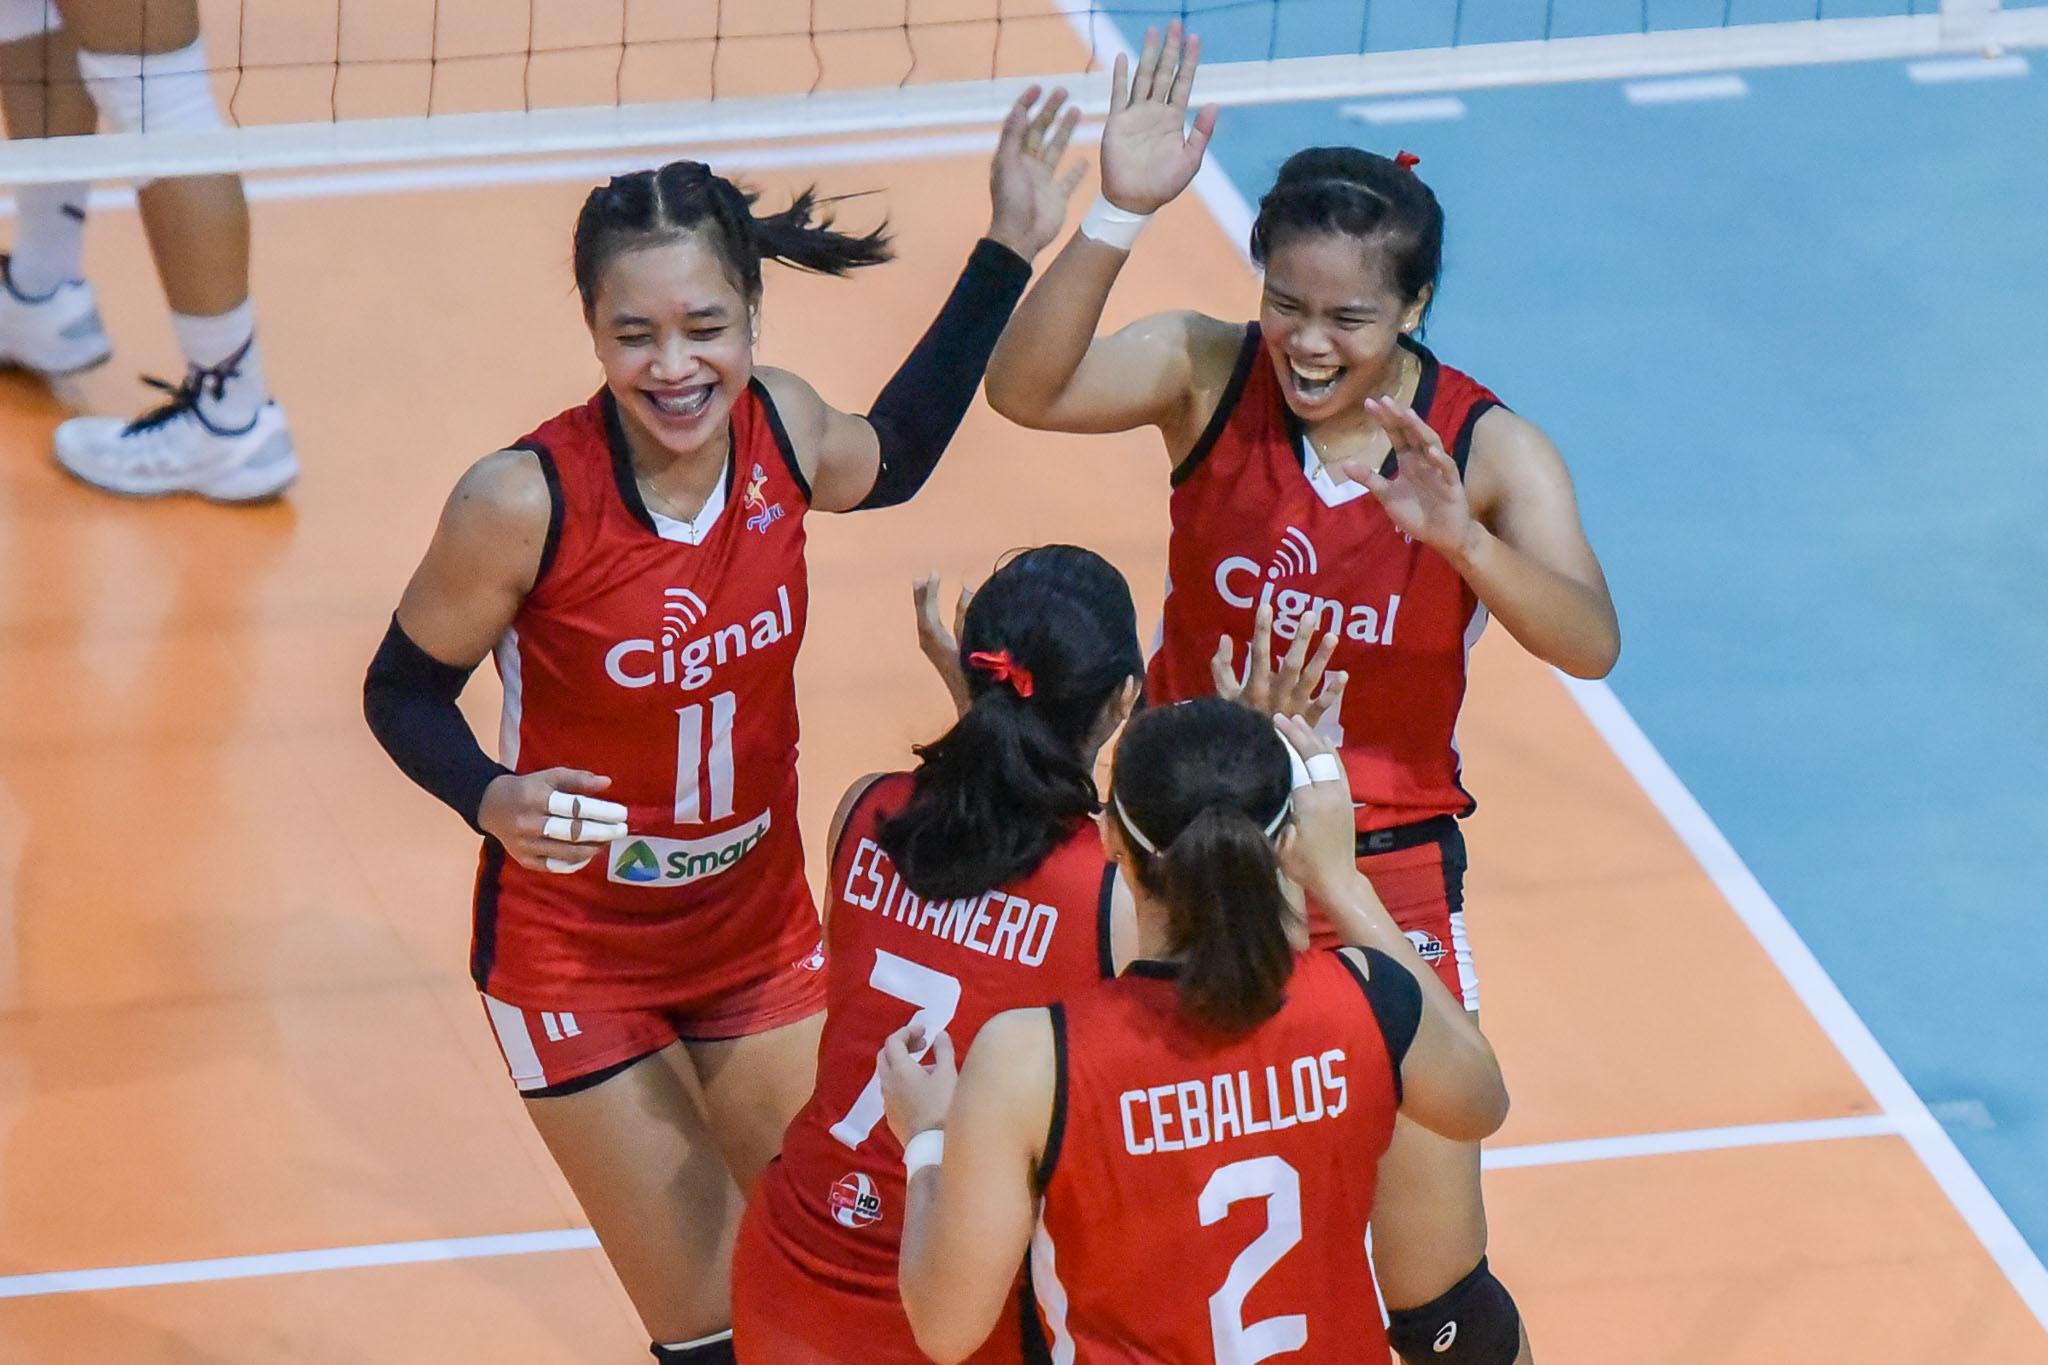 2021-PVL-Open-Cignal-vs.-Creamline-Roselyn-Doria-Klarissa-Abriam-5634 Shaq Delos Santos hopes for 'good ending' for also-ran Cignal News PVL Volleyball  - philippine sports news